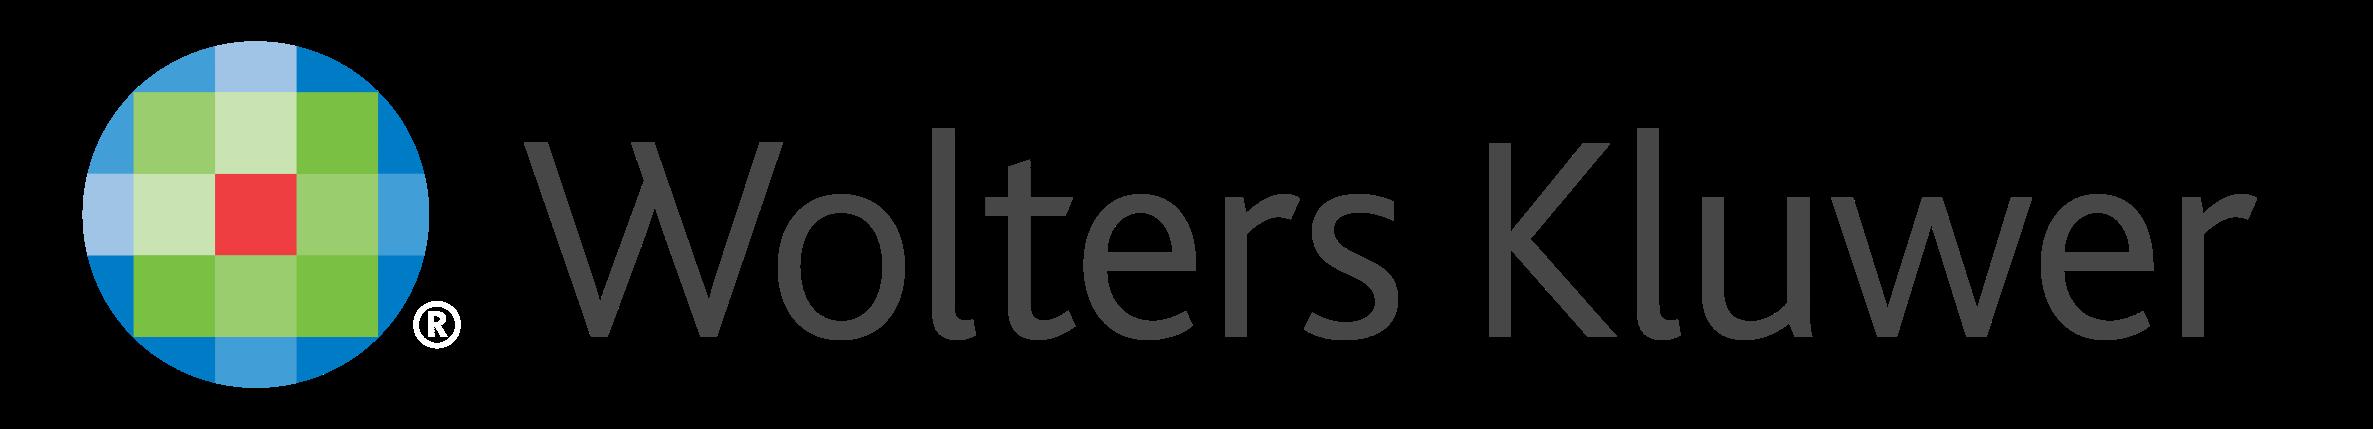 Wolters_Kluwer_logo_logotype